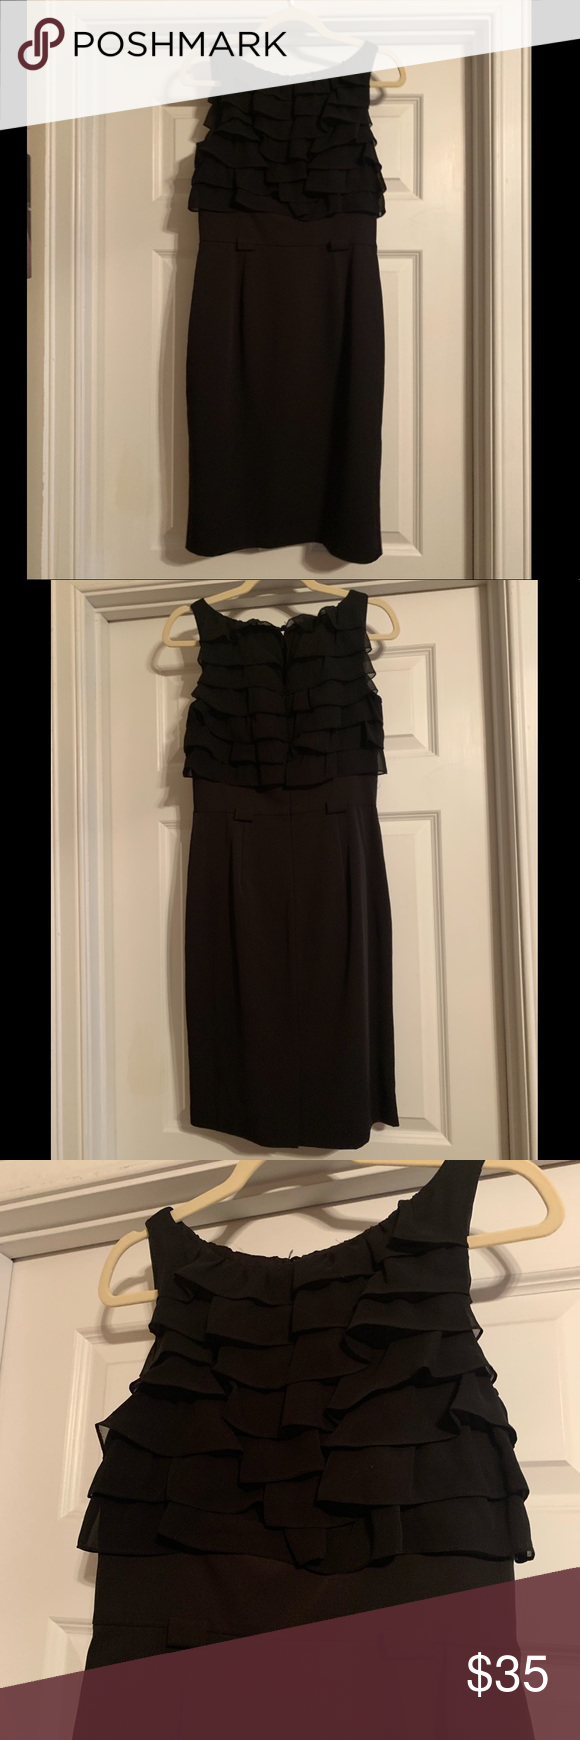 Calvin Klein Black Dress With Ruffle Detail Us 4 Calvin Klein Black Dress Black Knee Length Dress Calvin Klein Black [ 1740 x 580 Pixel ]